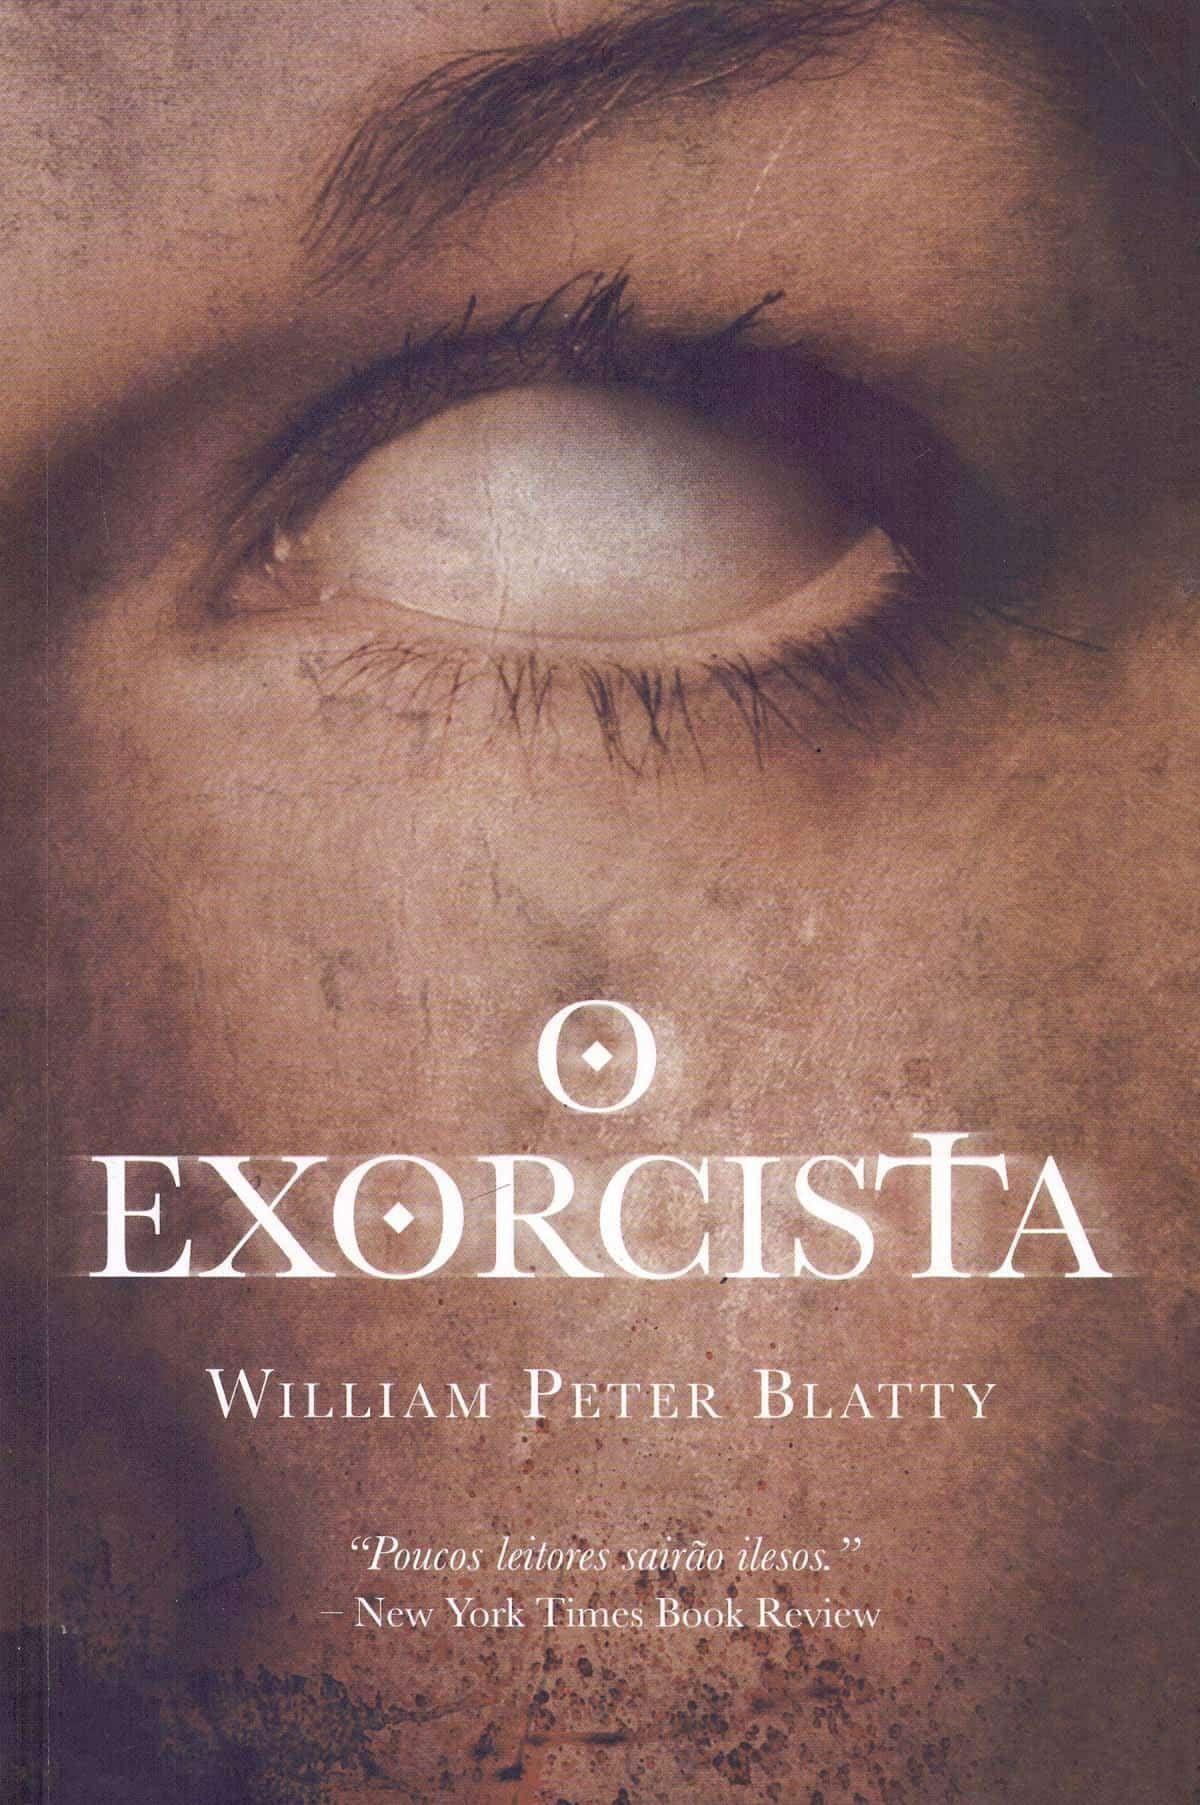 livros-terror-o-exorcista